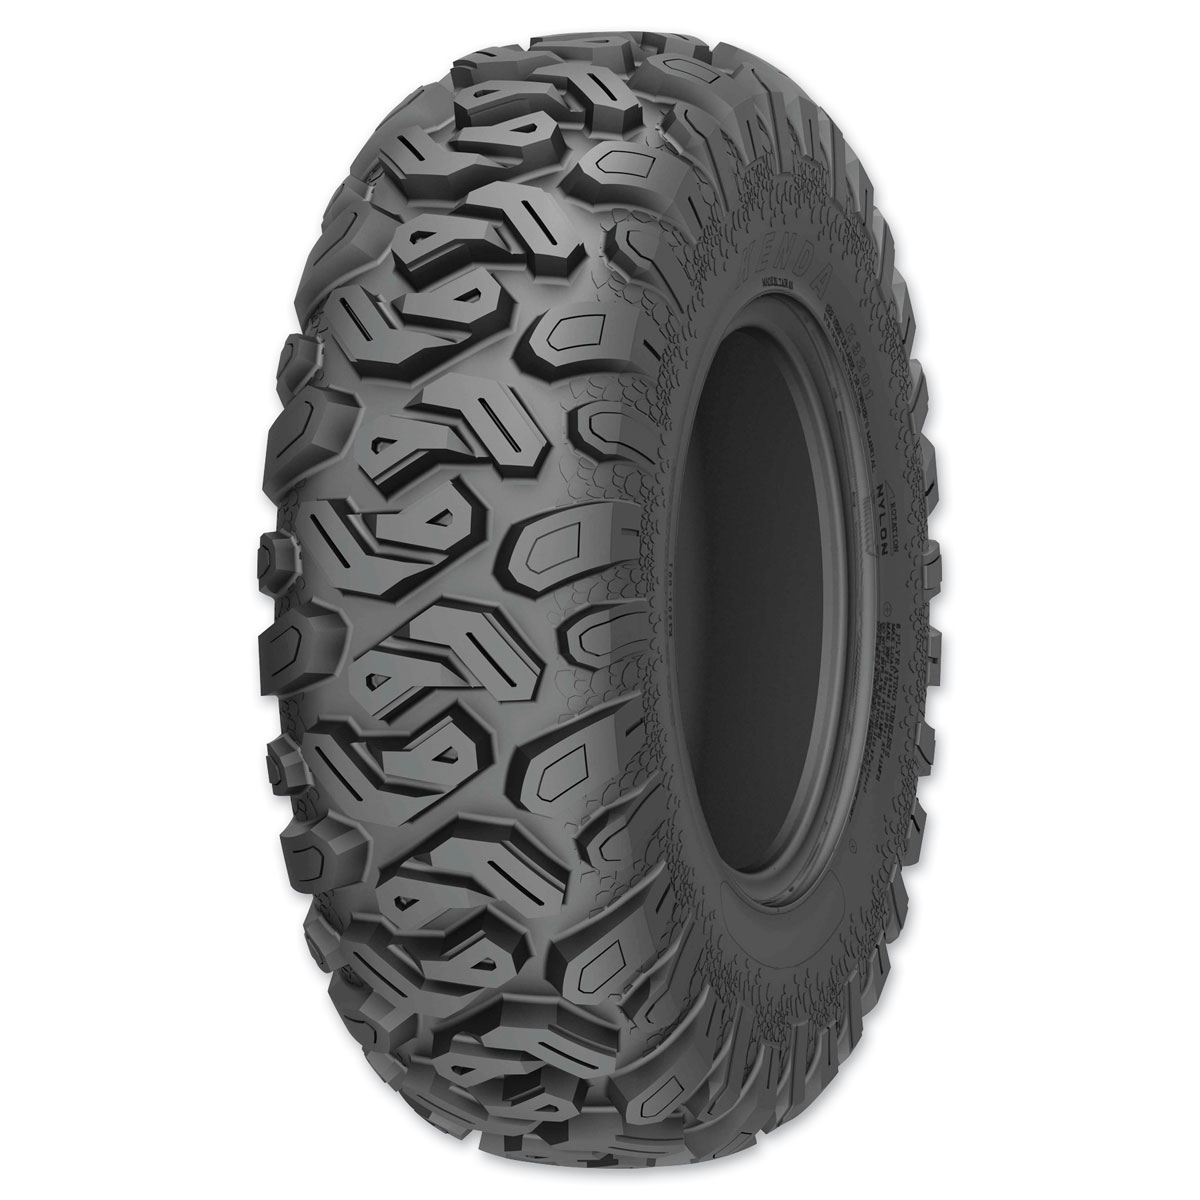 Kenda Tires Mastodon 26X9R-12 Front/Rear Tire